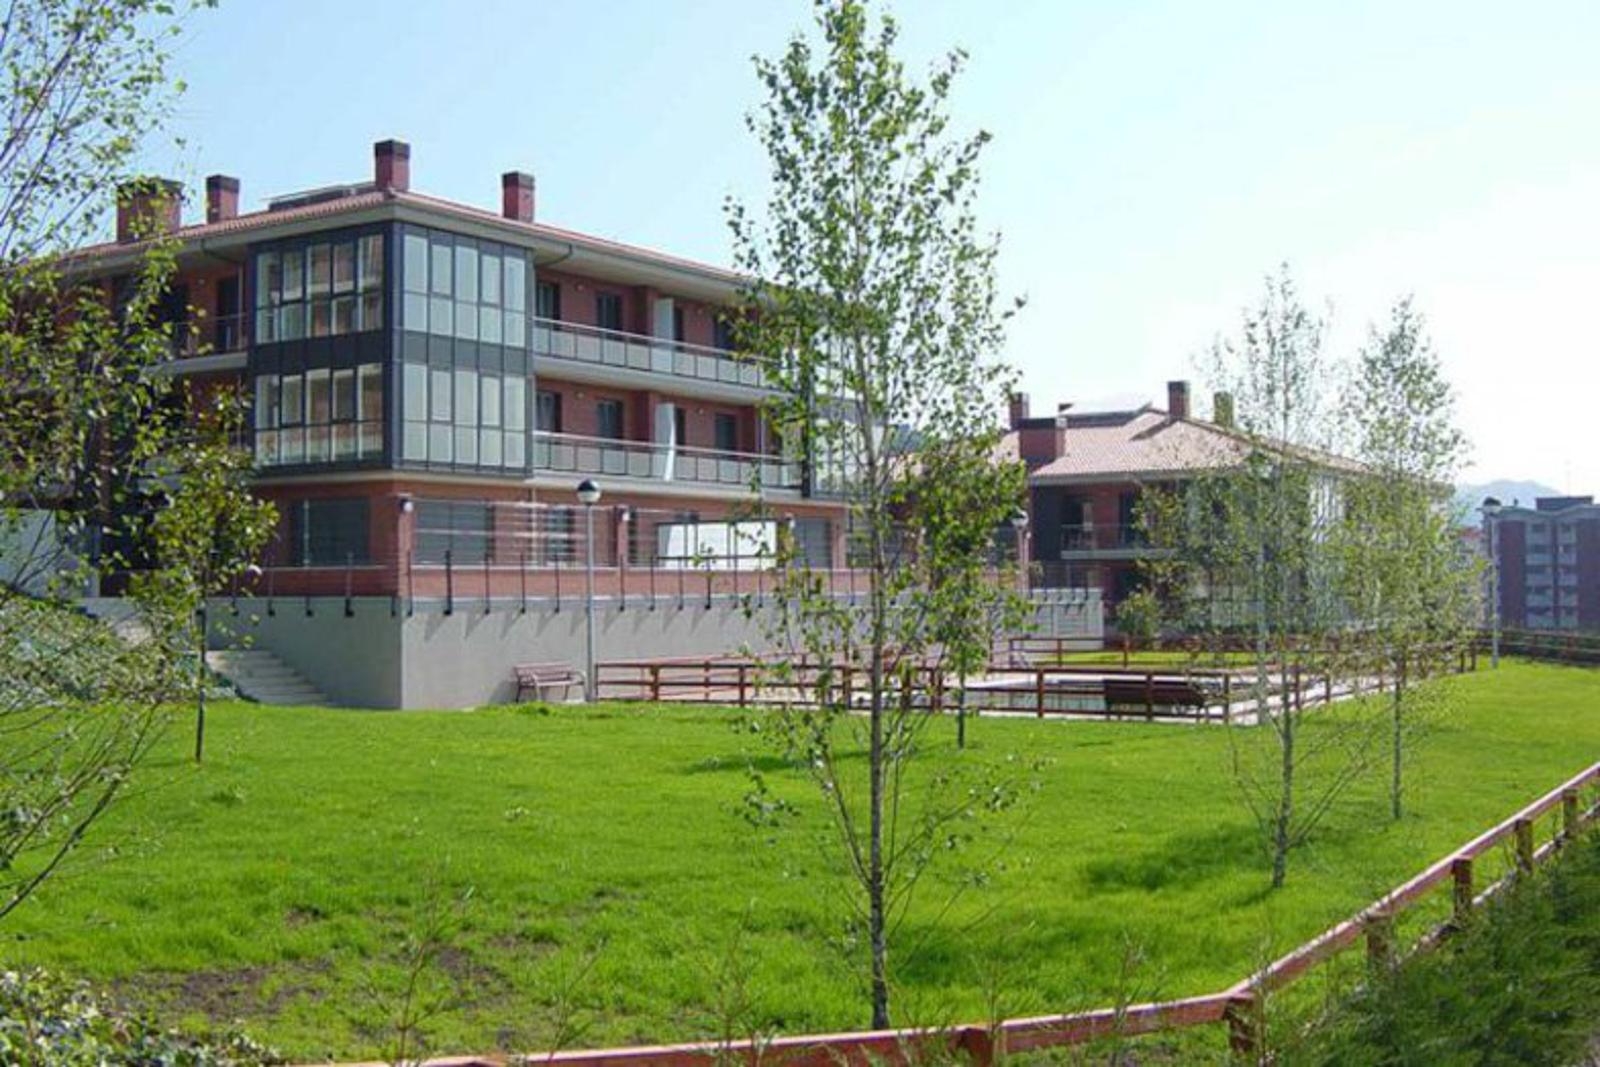 Viviendas en alto de miracruz construcciones sukia for Piscina zabalgana